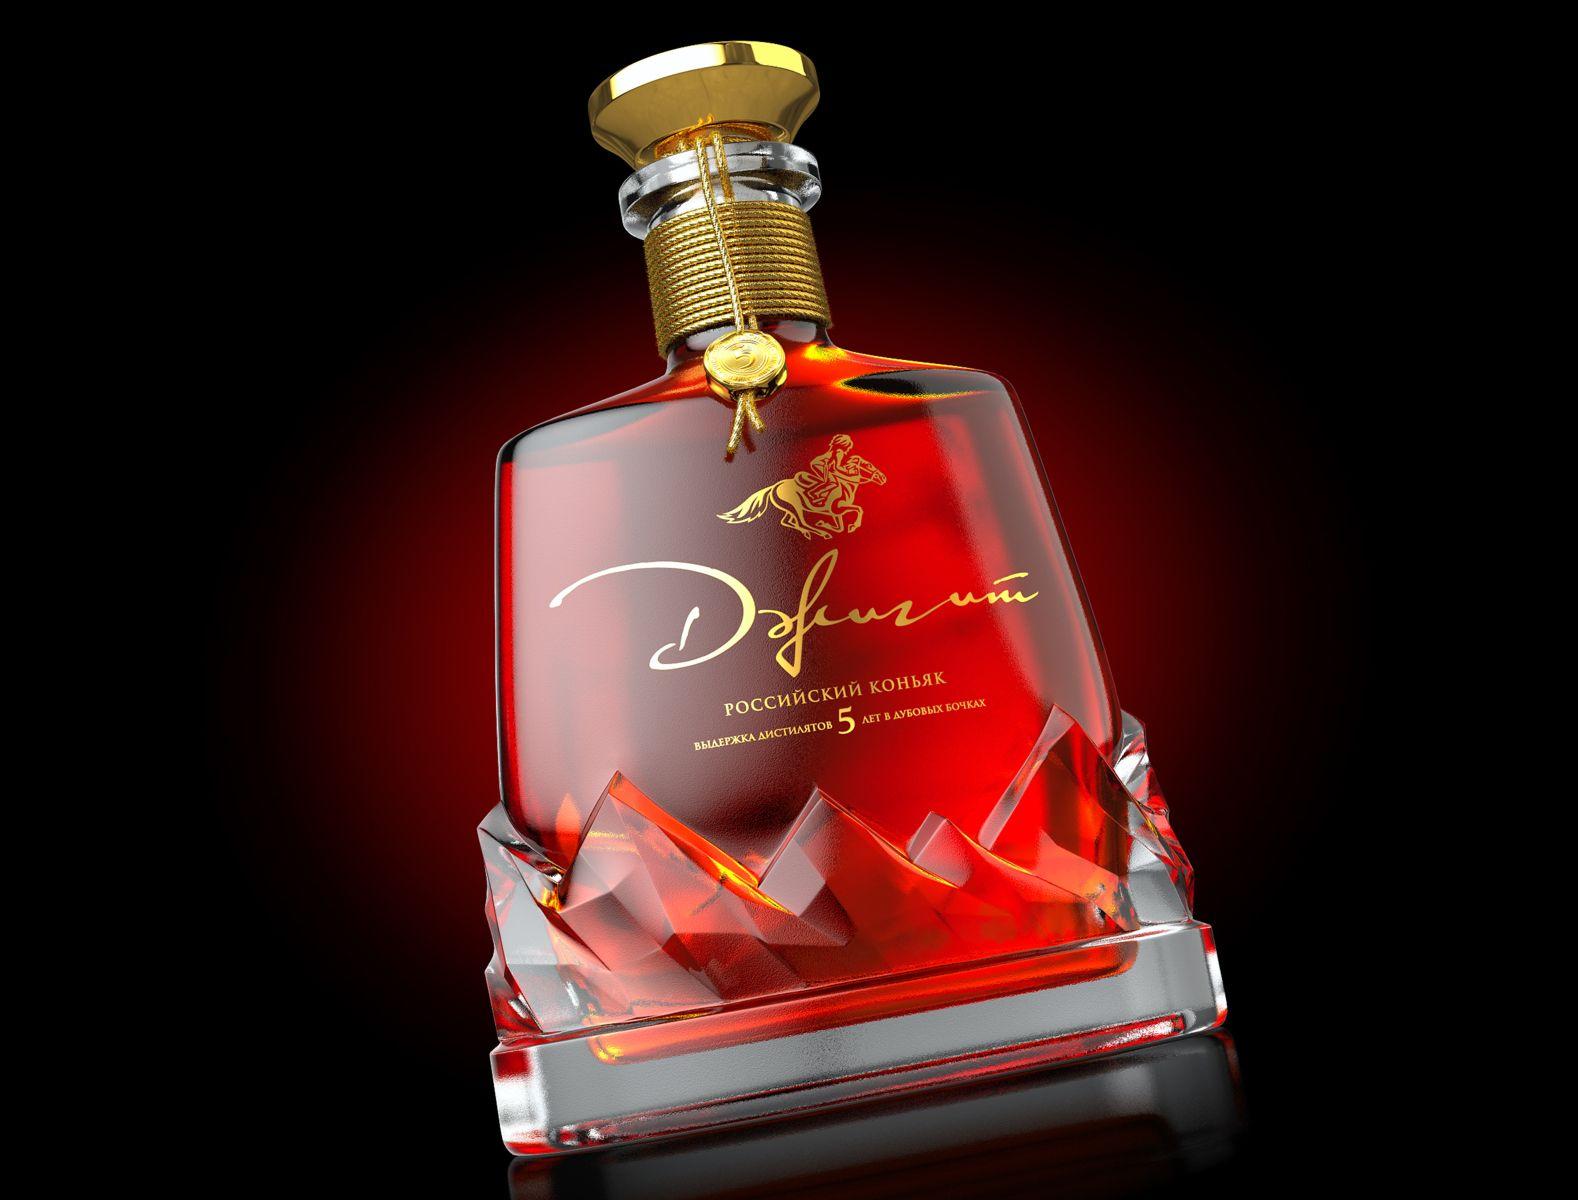 Jigit Brandy On Packaging Of The World Creative Package Design Gallery In 2020 Bottle Design Wine Label Design Whiskey Packaging